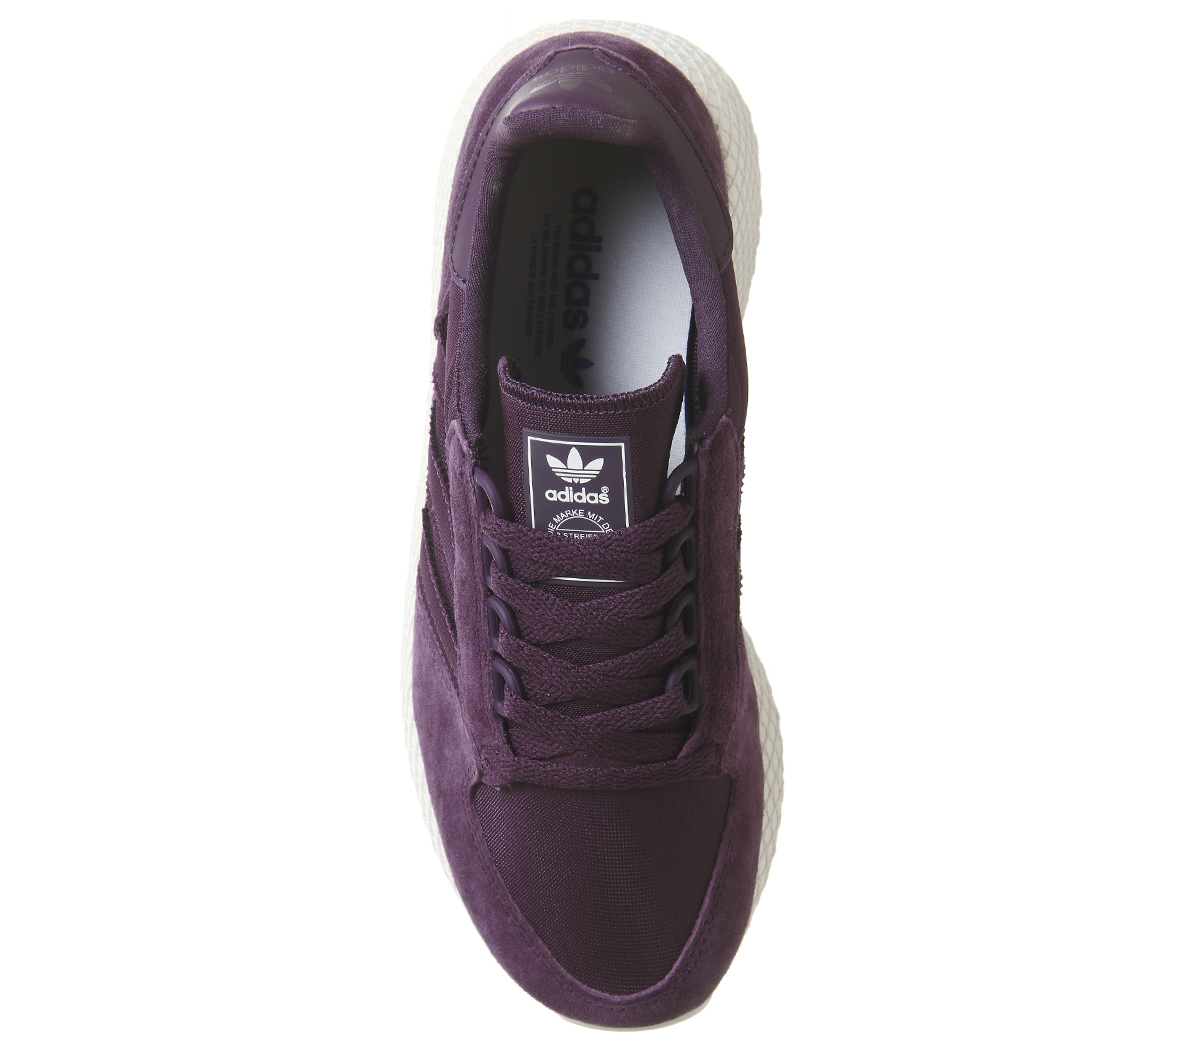 Damenschuhe Adidas Forest Grove Trainers ROT NIGHT Weiß CLOUD Weiß NIGHT GREY ONE Trainers Schuhe 7f5428